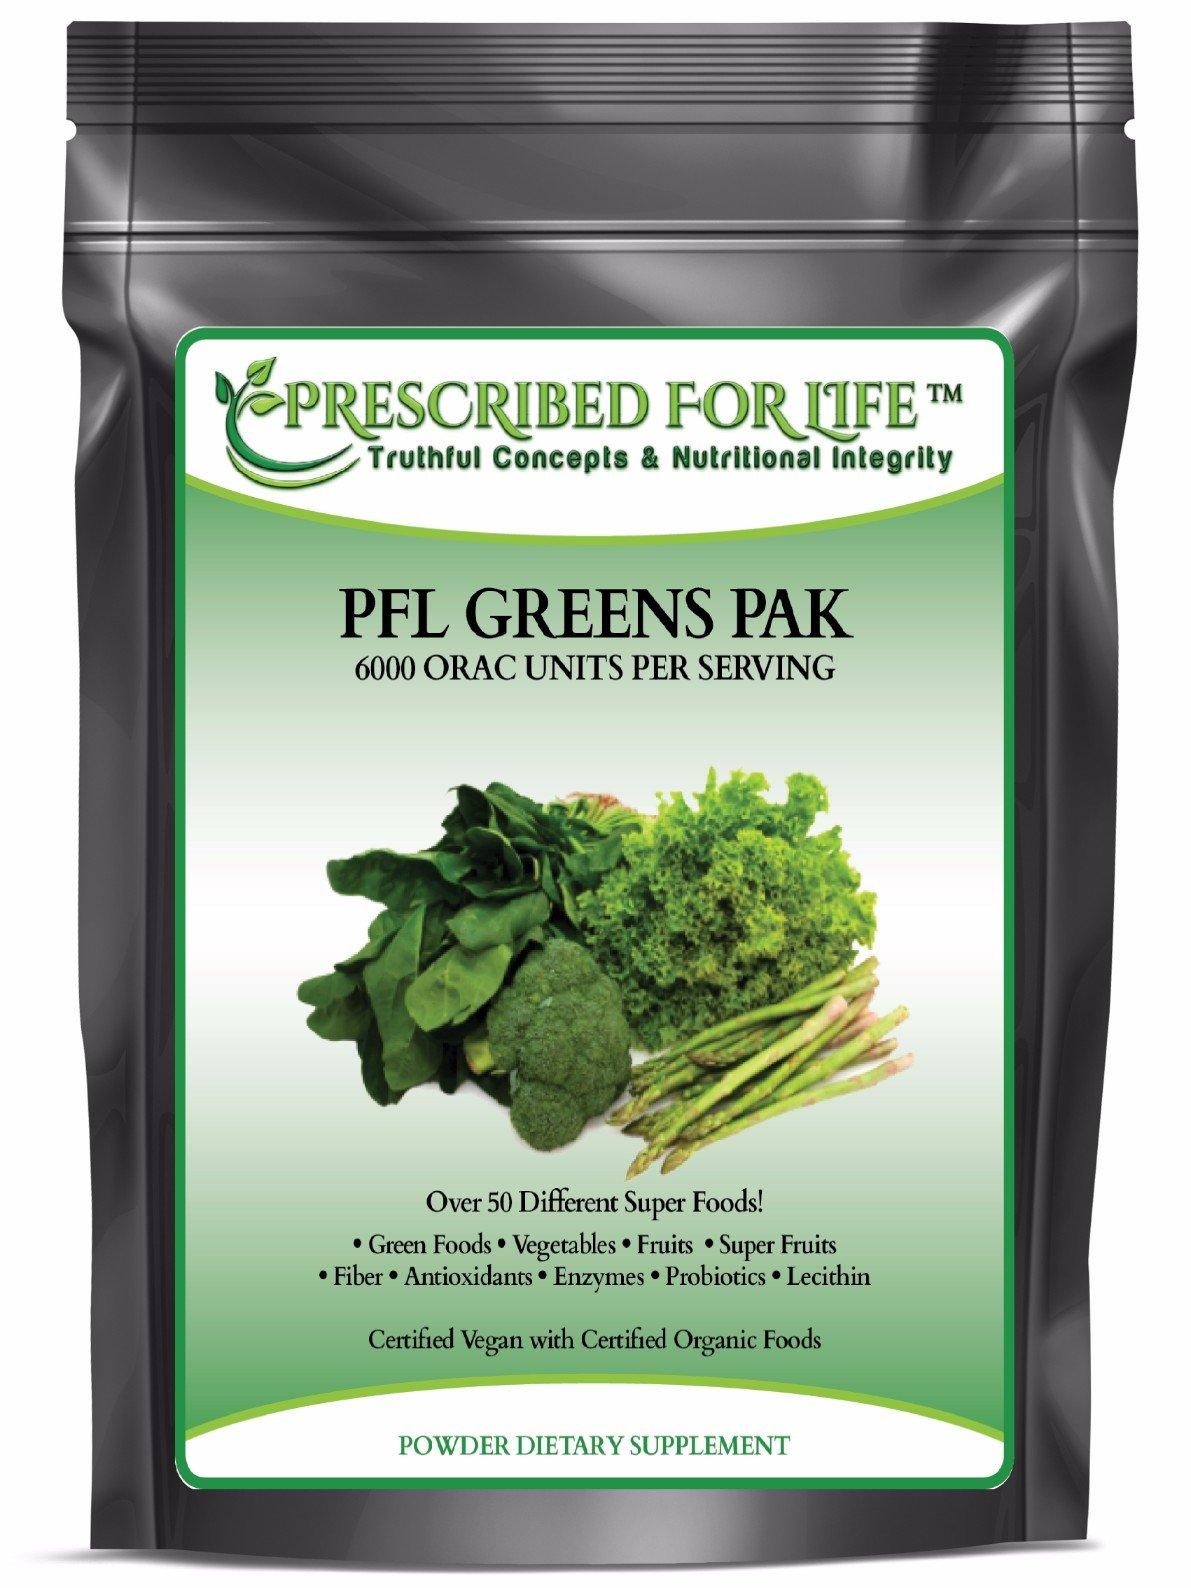 Greens Pak - Super Food & Vegetable Blend with Antioxidants & Phytonutrients ING: Organic Powder, 55 lb